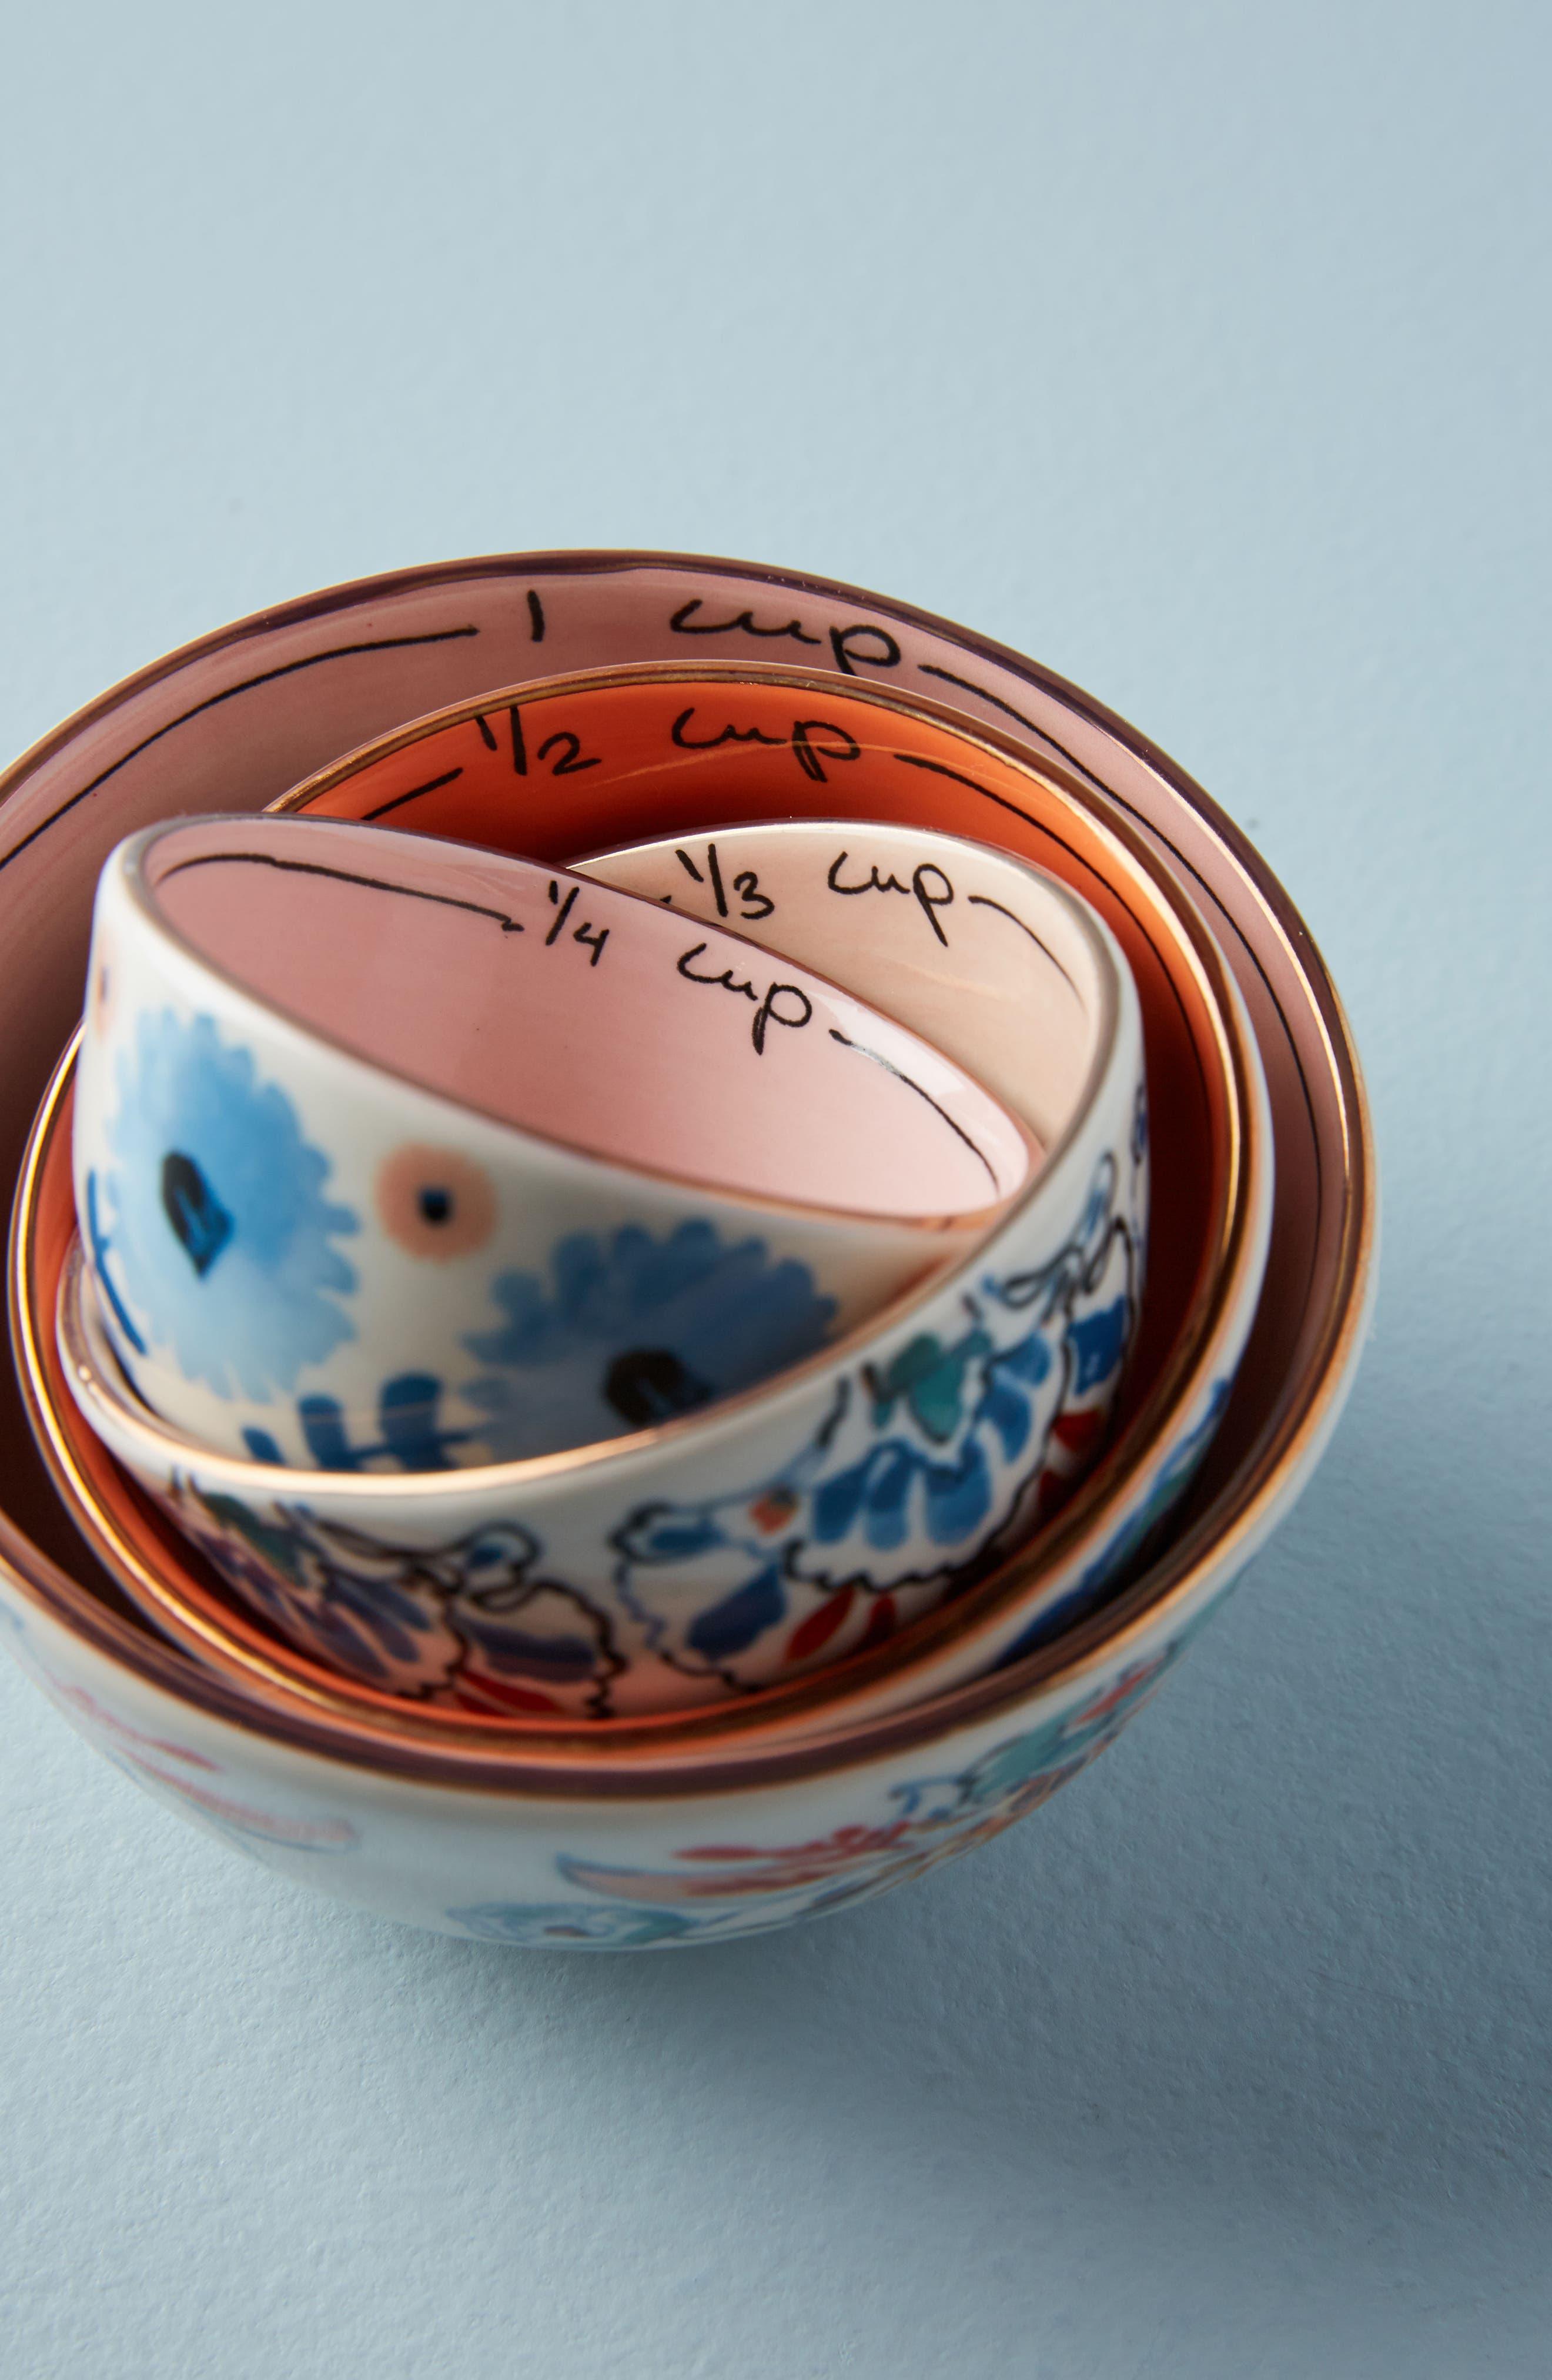 Anthropologie Eres Set of 4 Measuring Cups